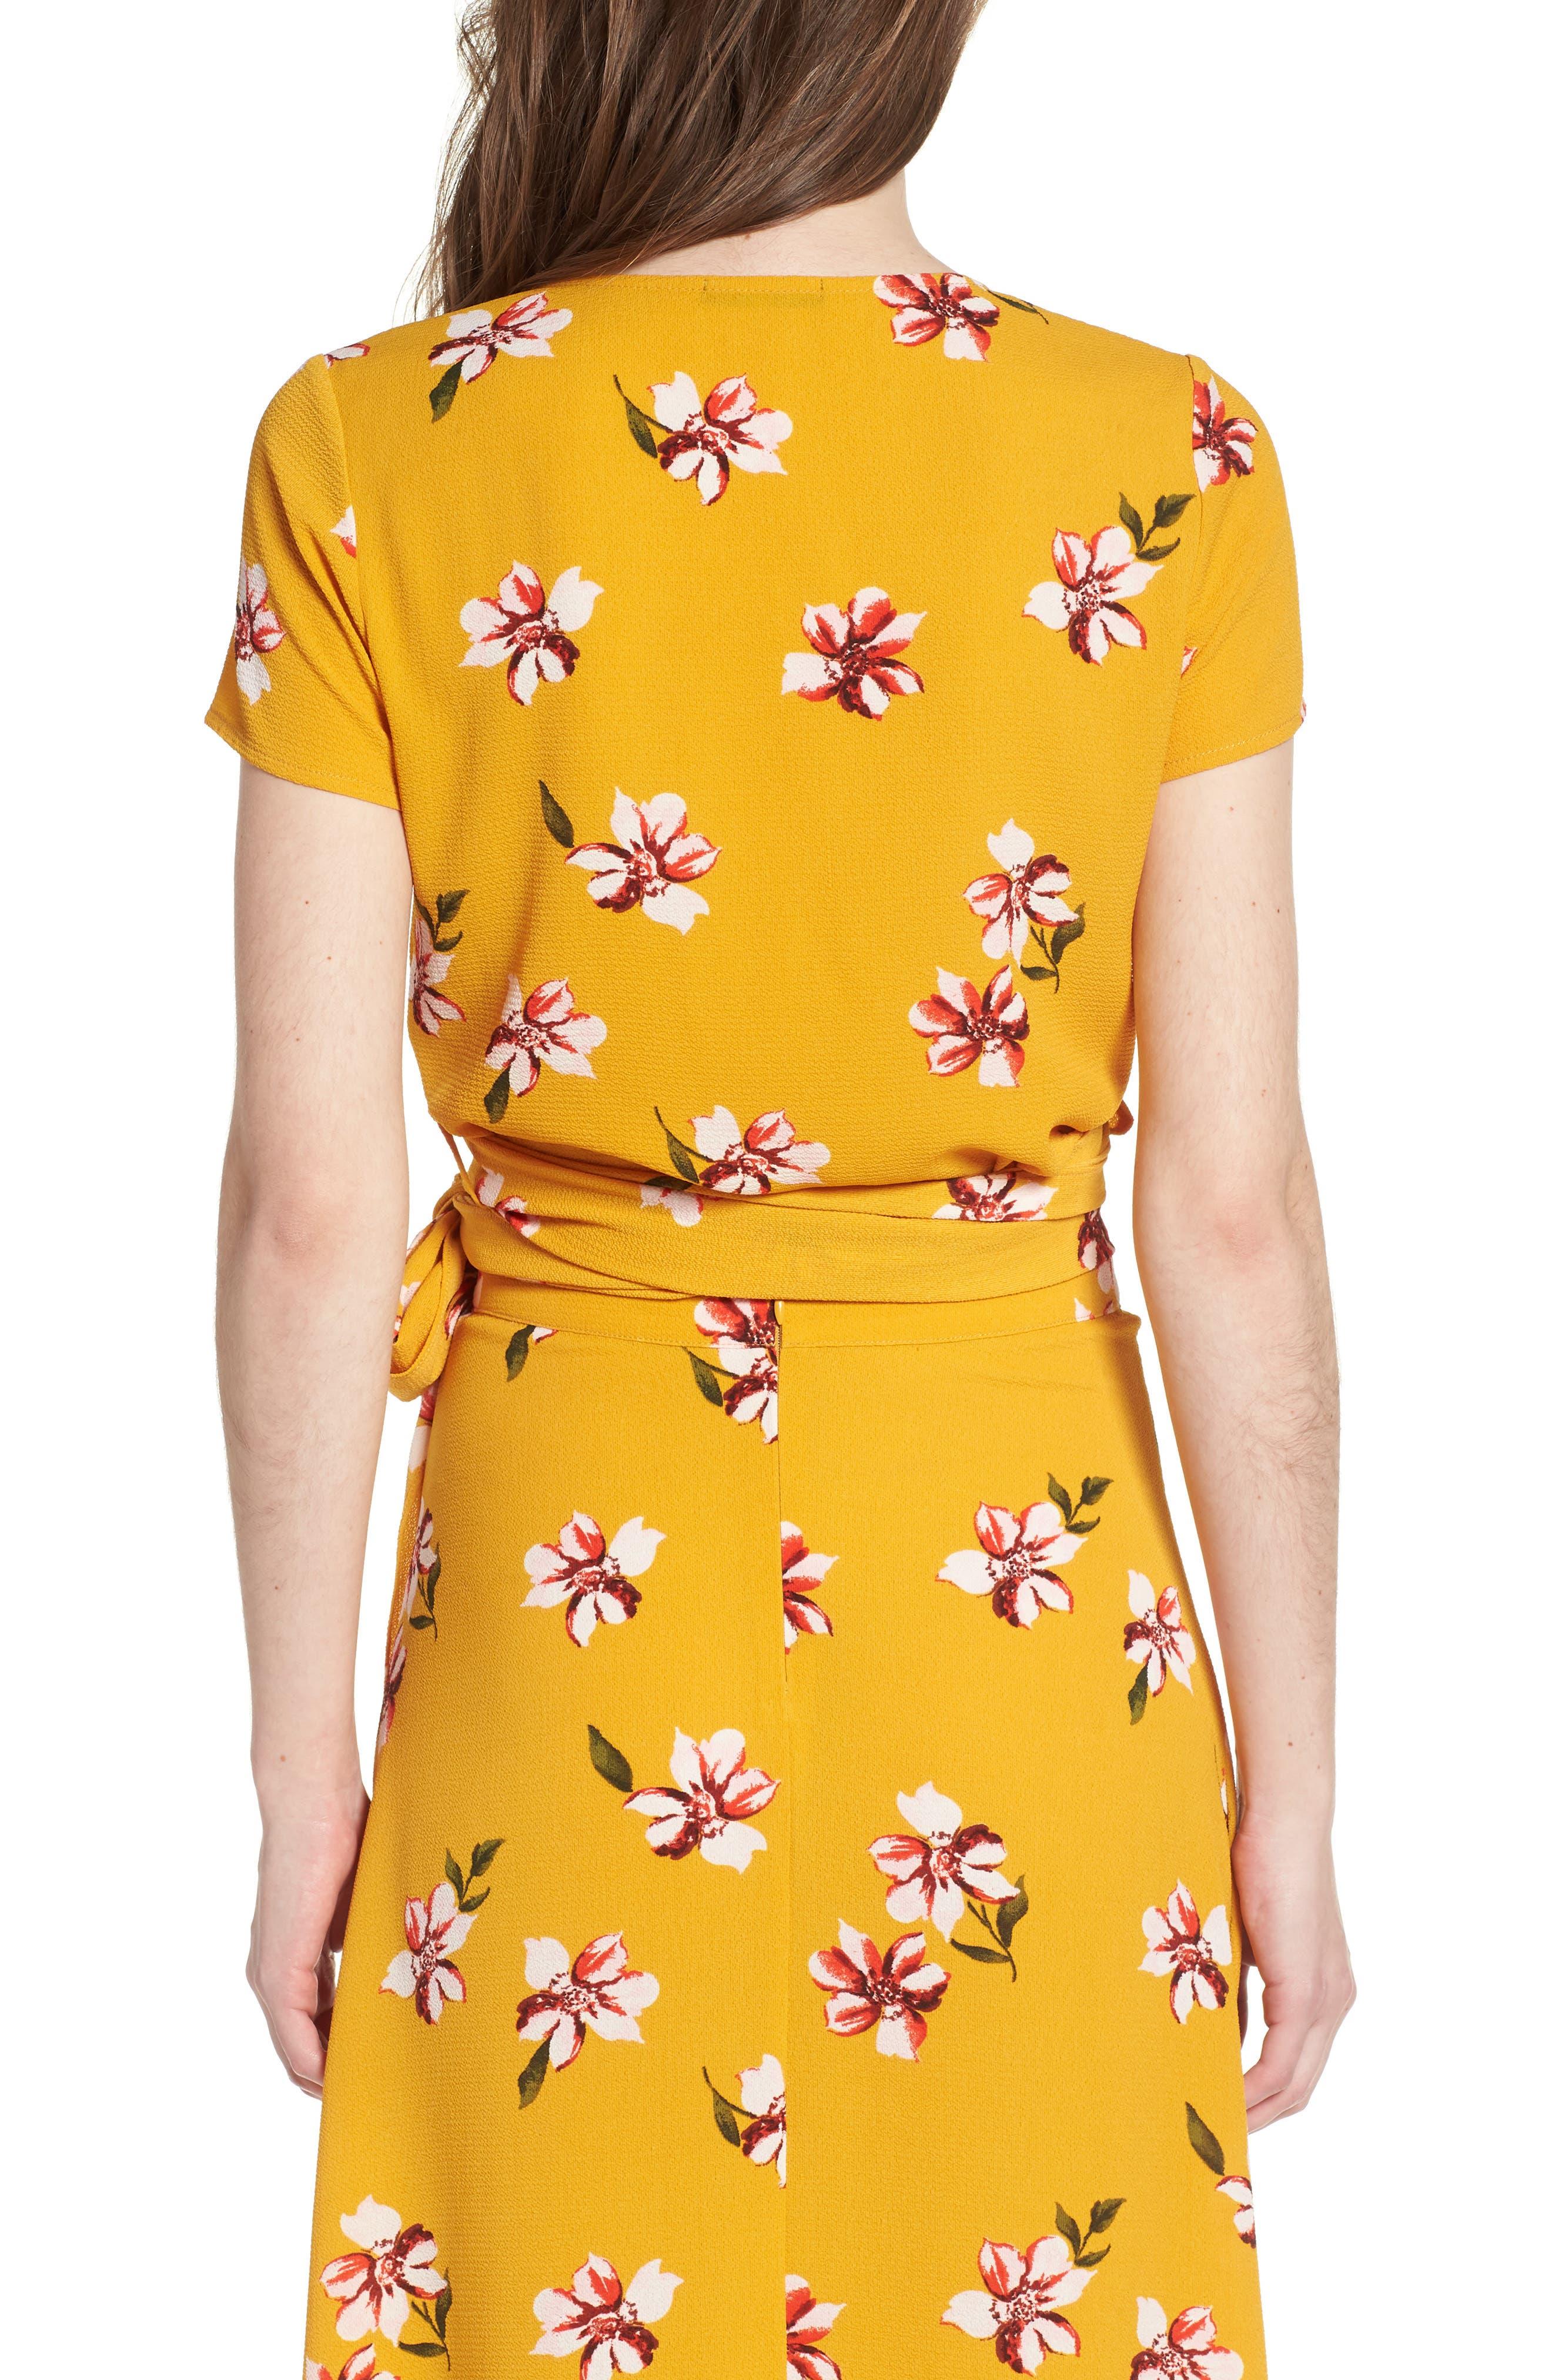 Floral Wrap Crop Top,                             Alternate thumbnail 2, color,                             Mustard Floral